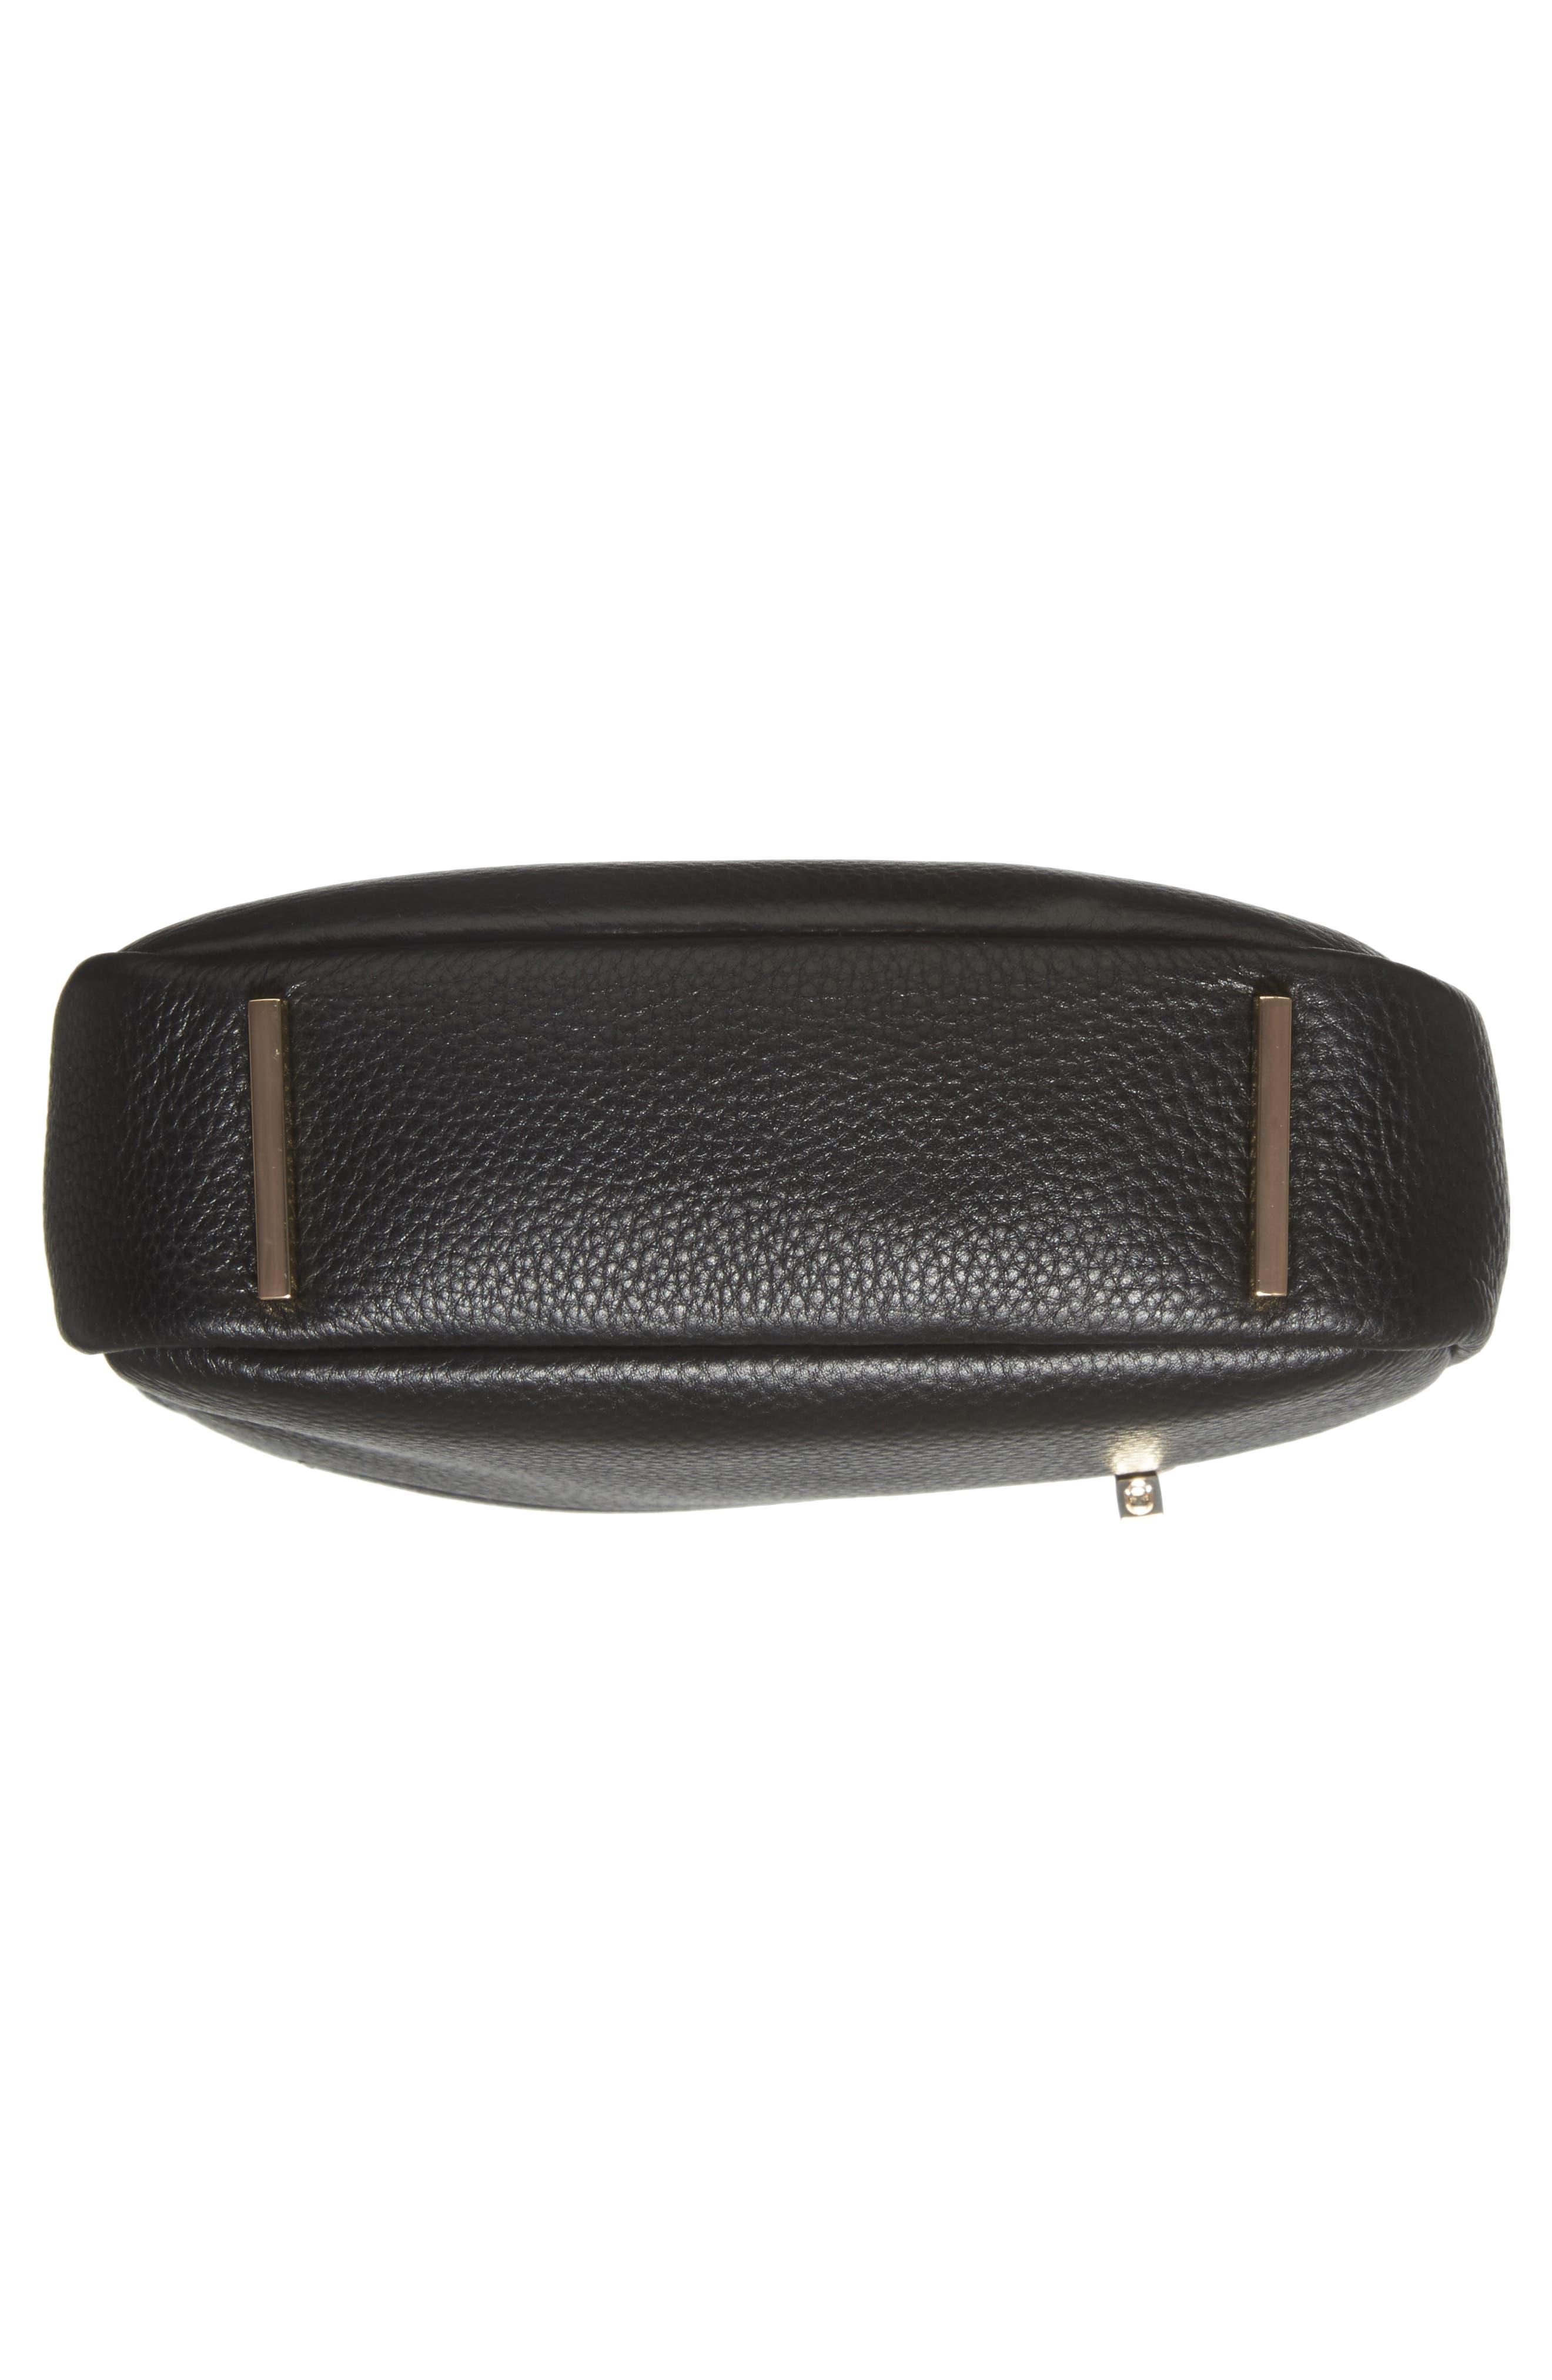 Céline Dion Adagio Leather Camera Crossbody Bag,                             Alternate thumbnail 6, color,                             001